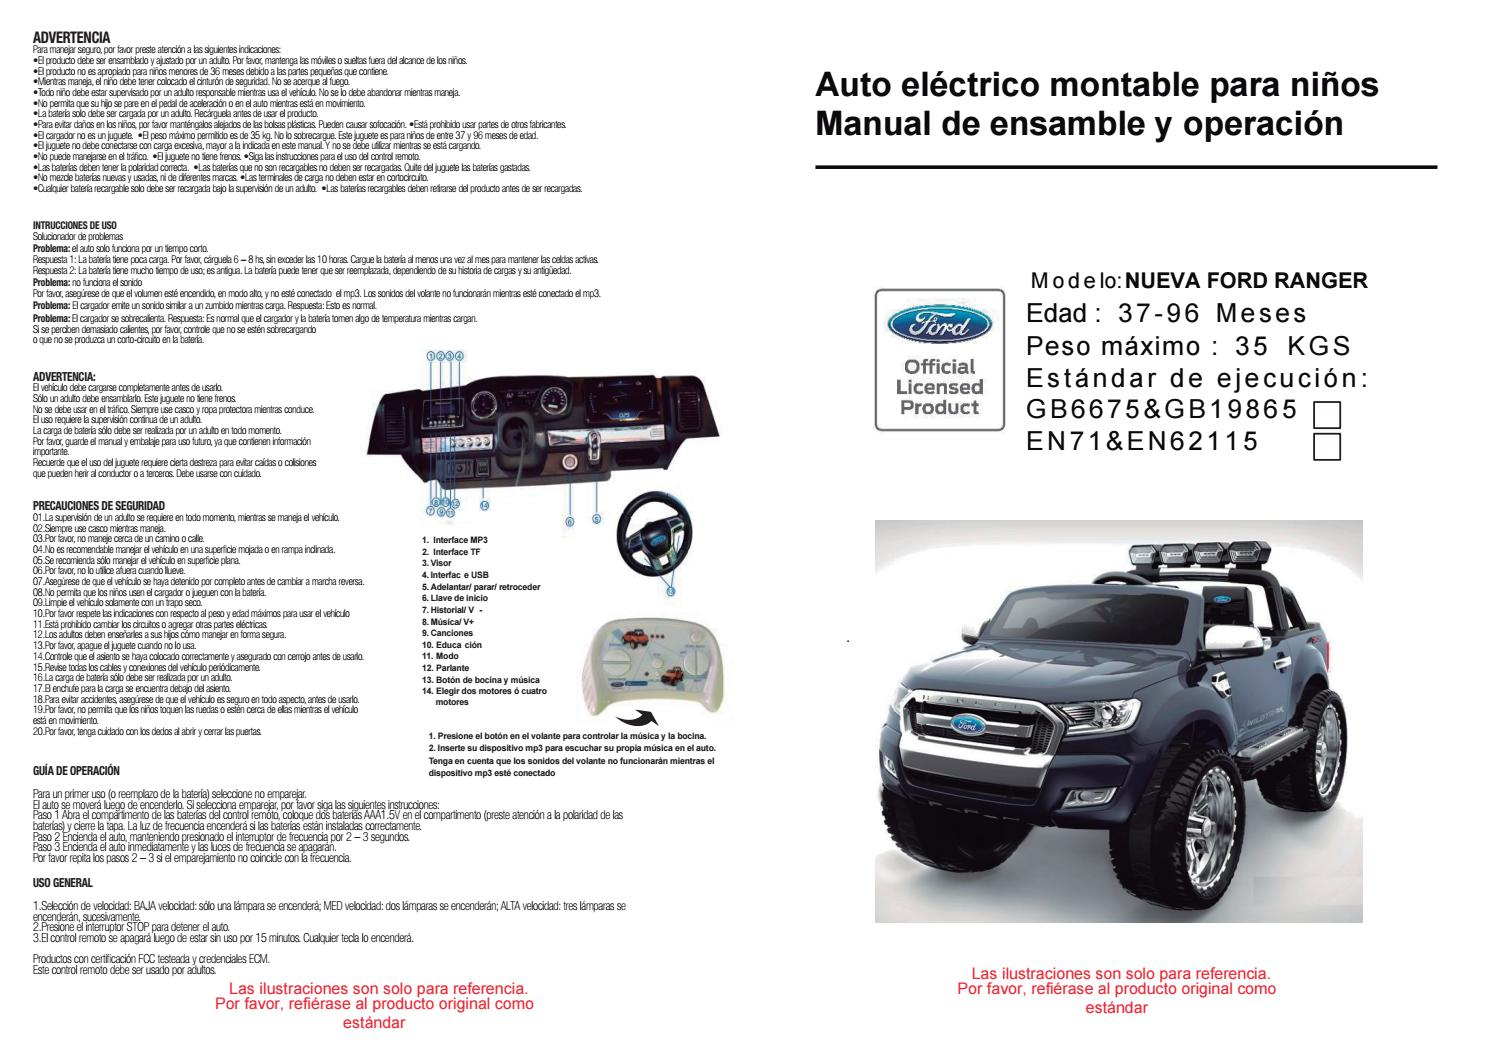 Manual De Usuario Ford Ranger Bjf650 By Importadora Sudamericana Issuu